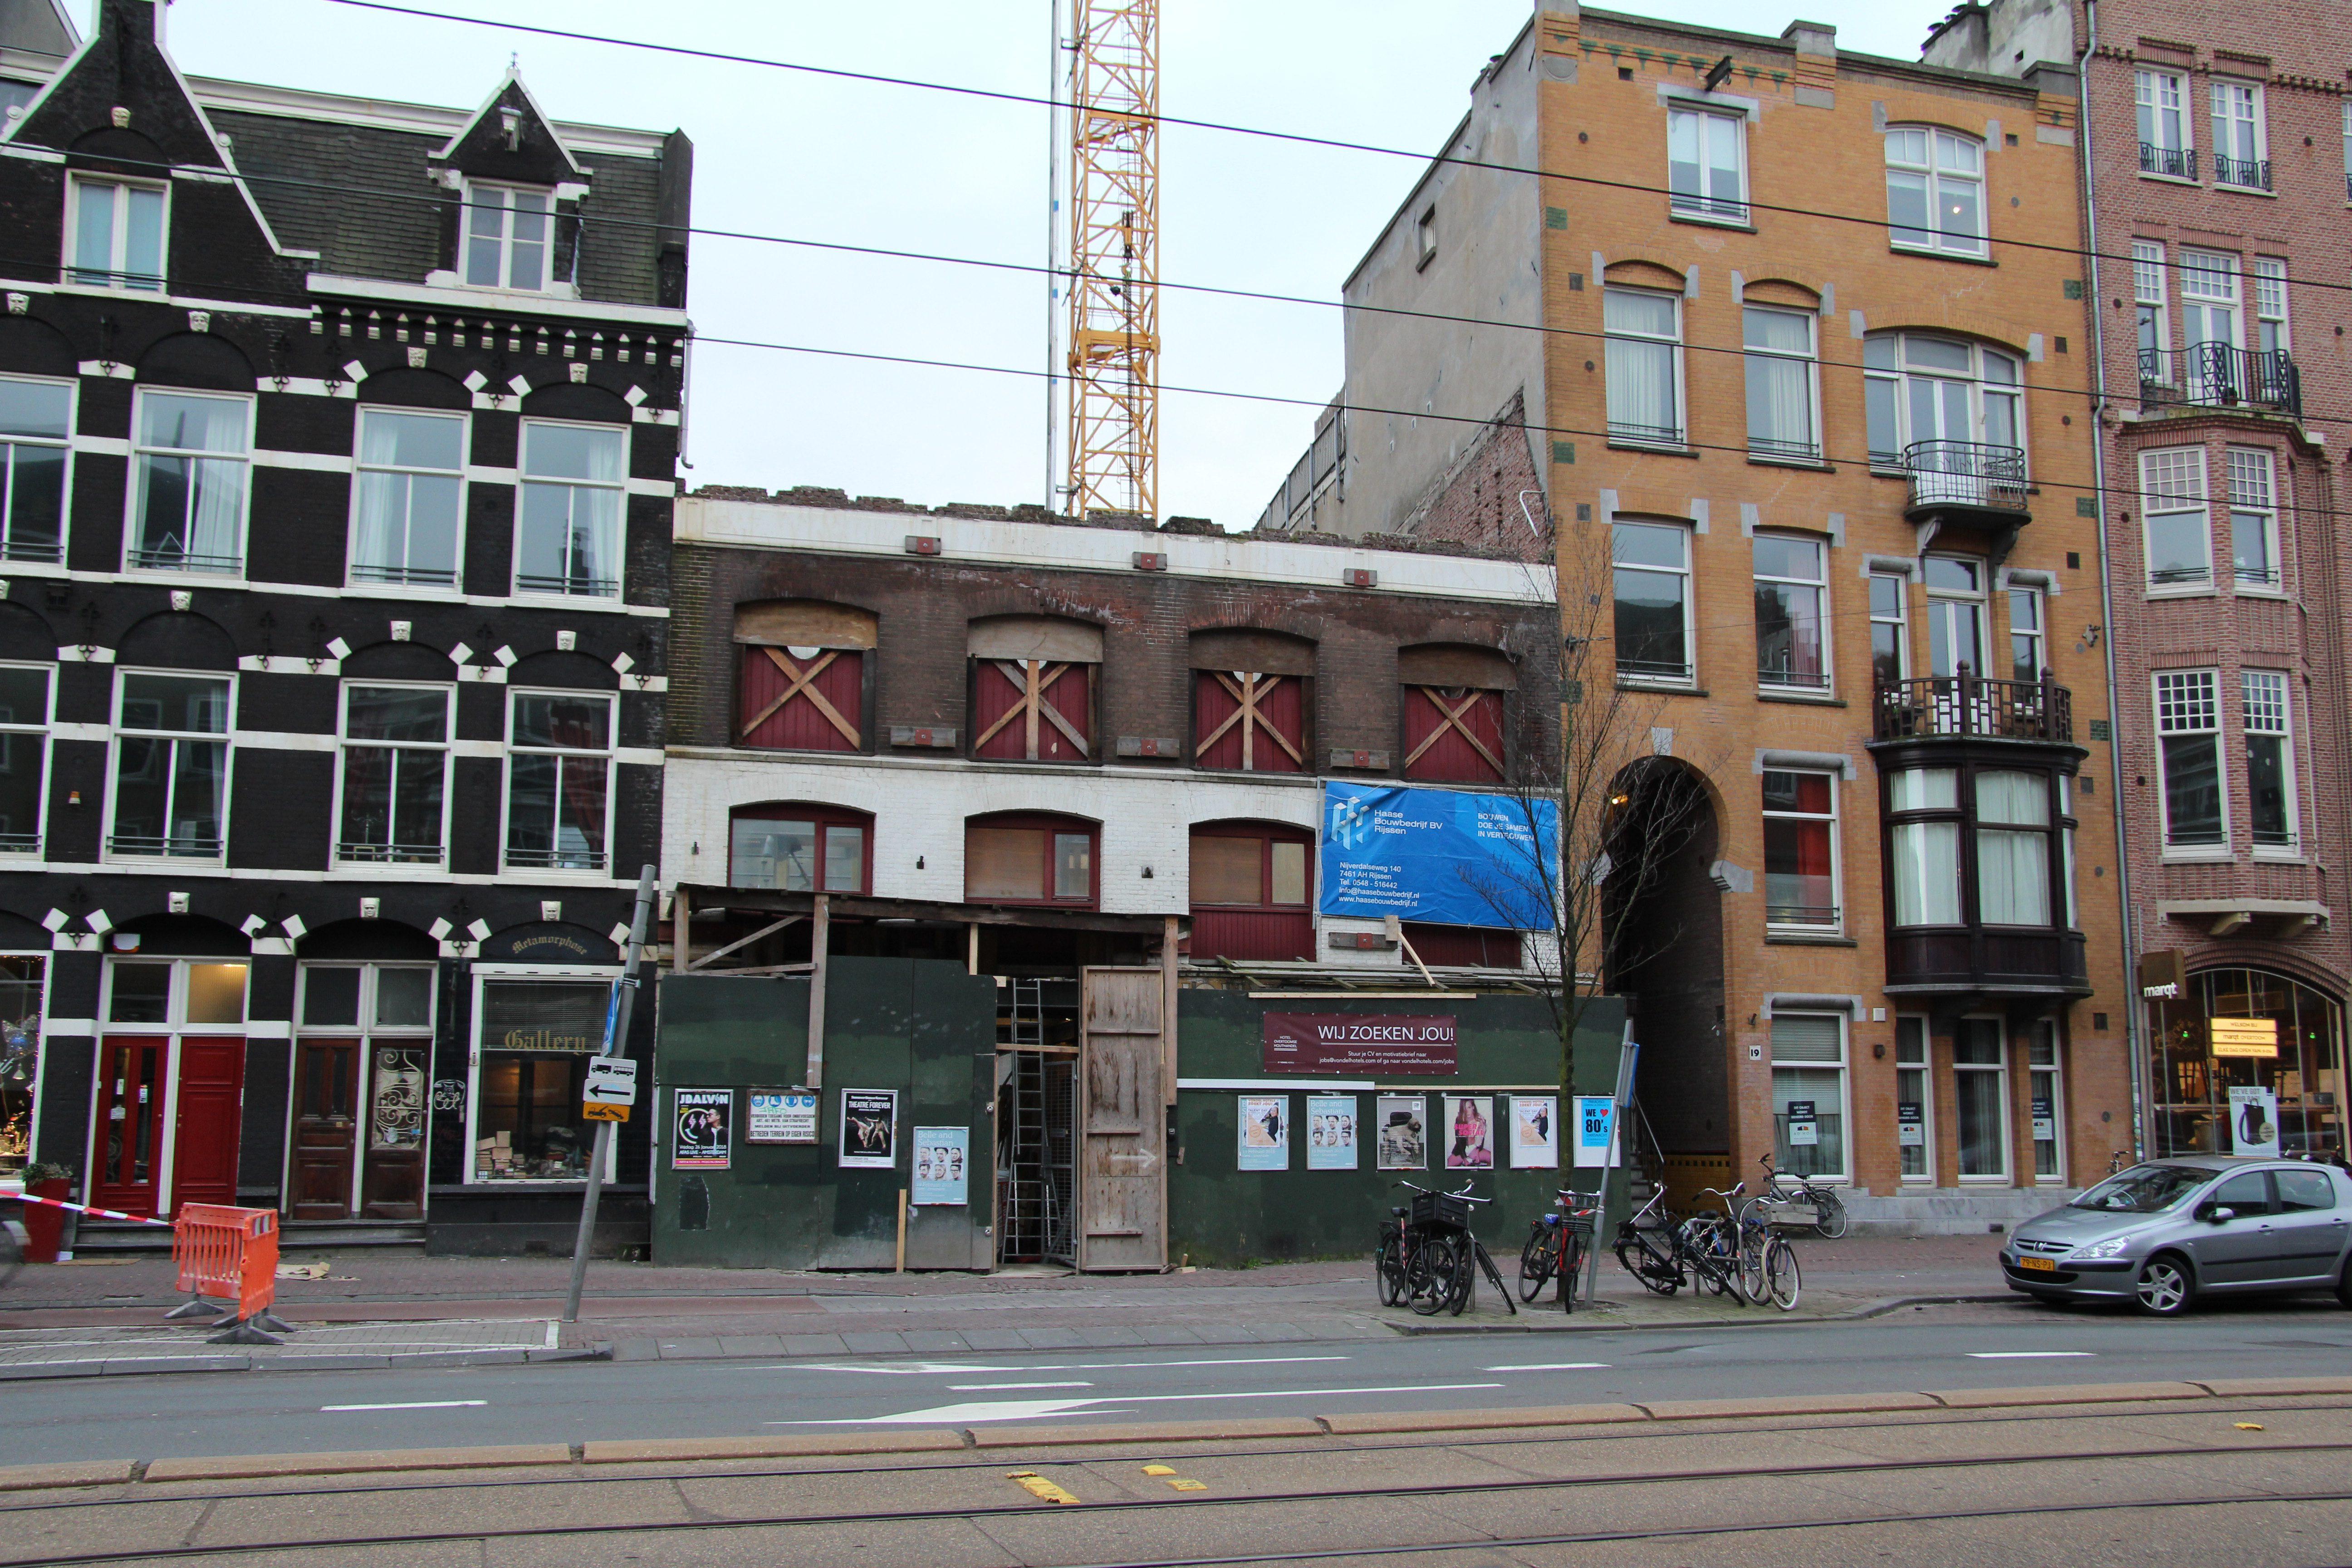 Gevel Overtoom hotel tussen oud hout Amsterdam